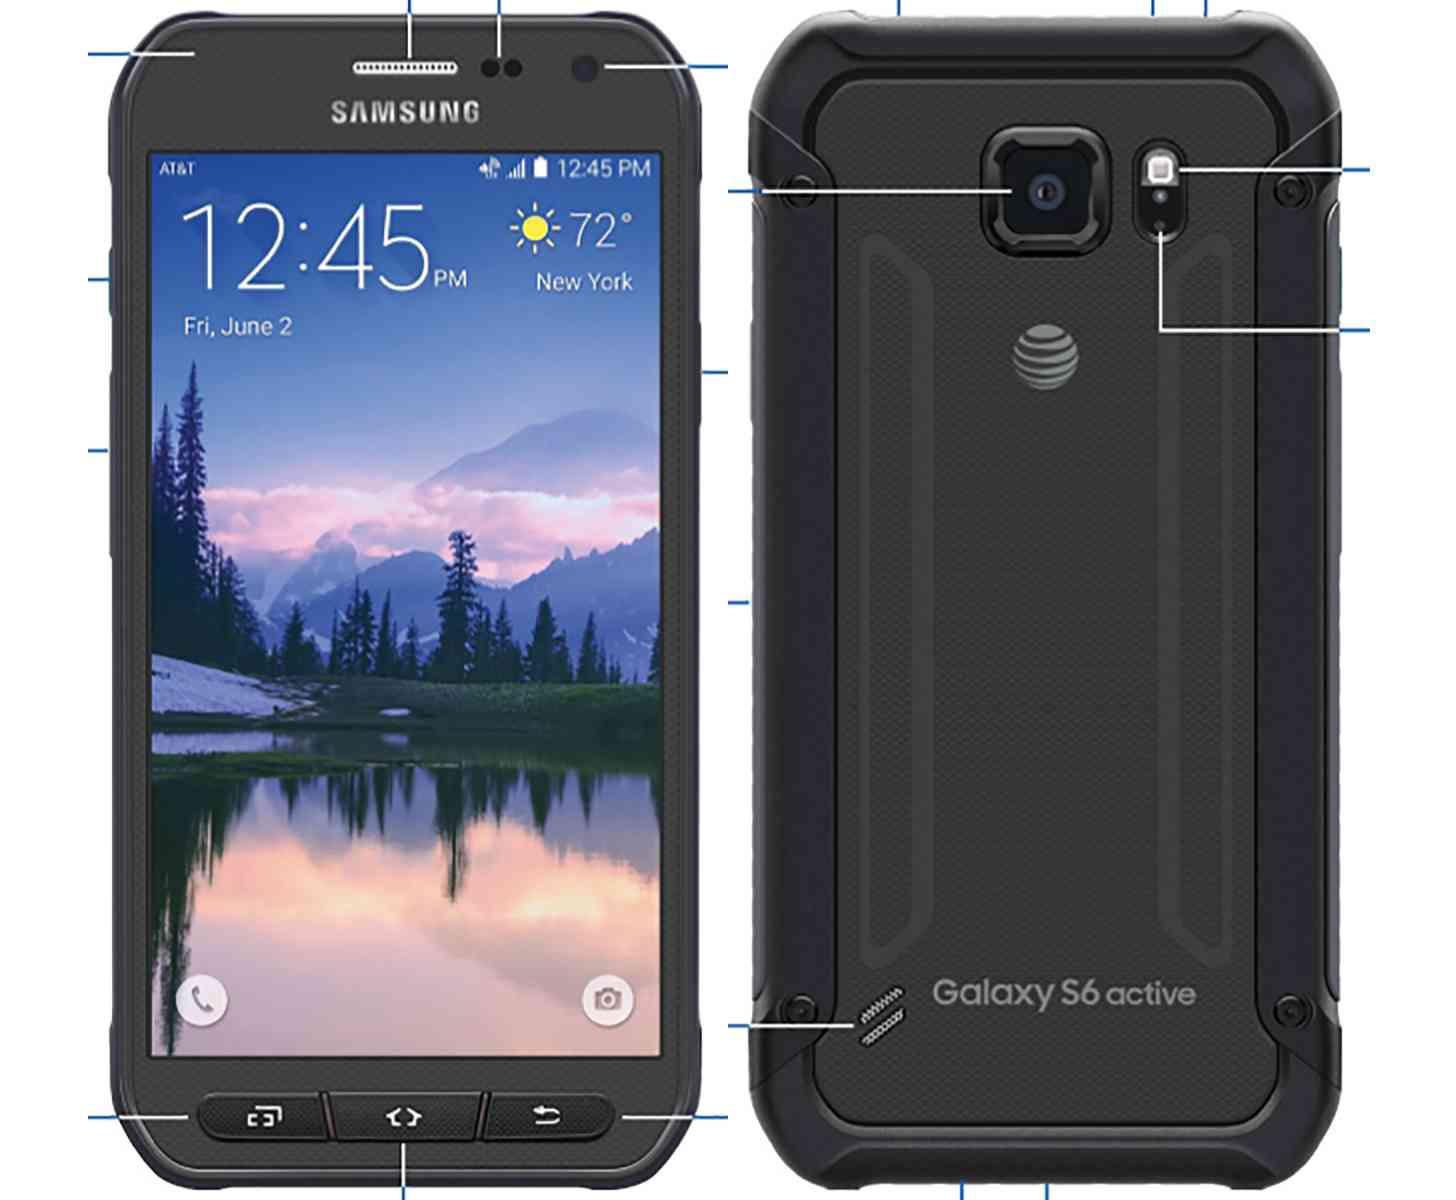 Samsung Galaxy S6 Active leak large